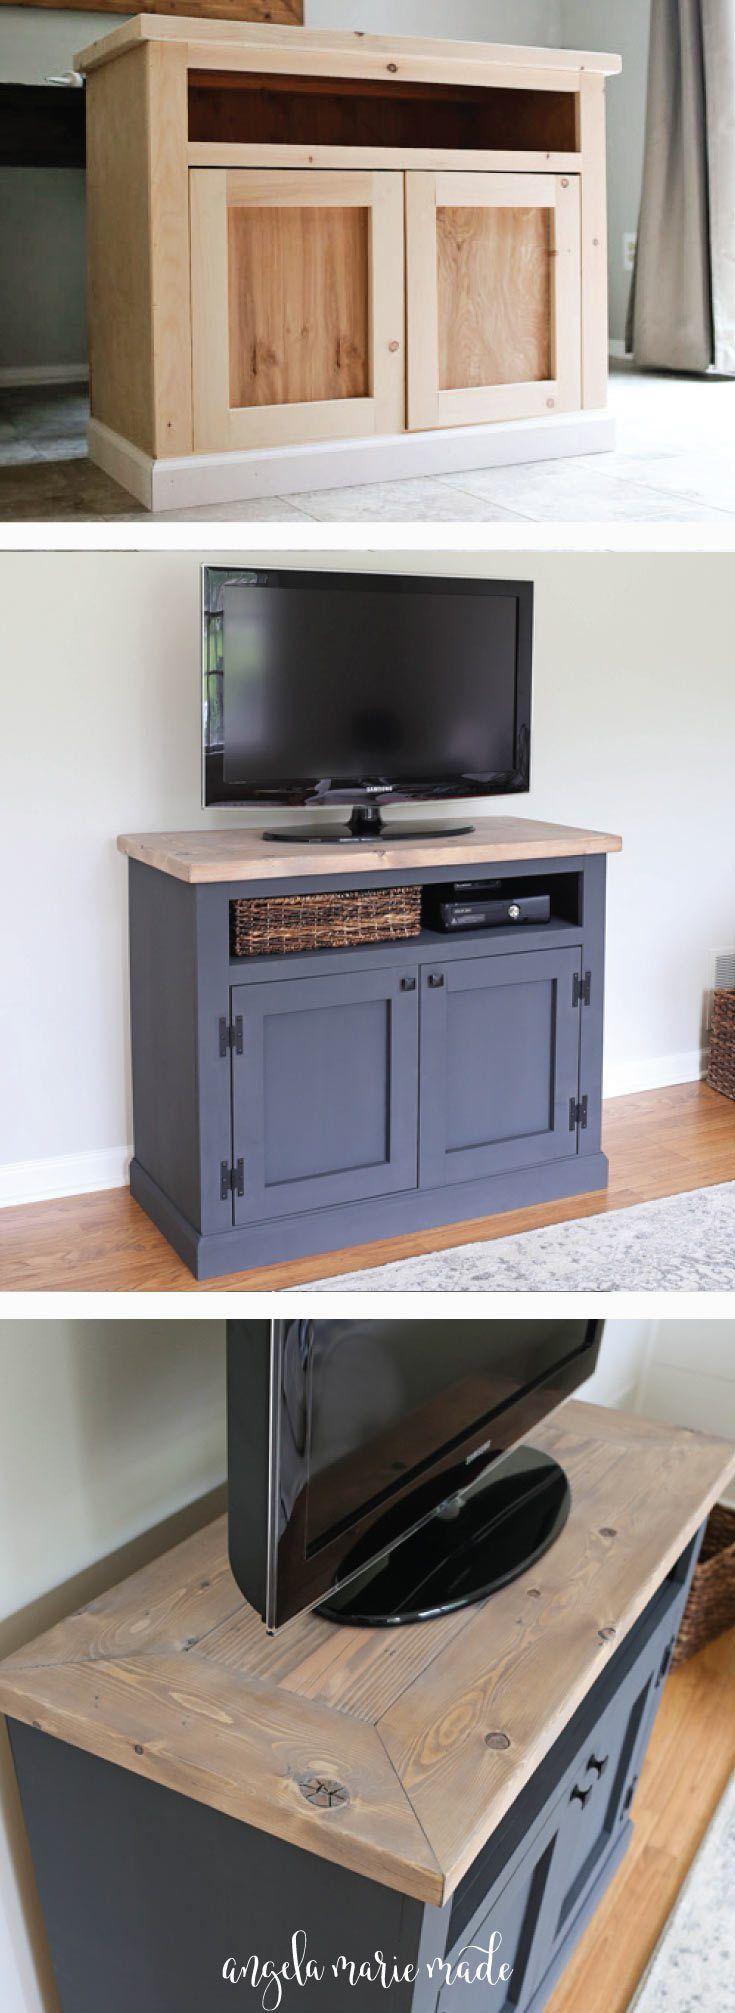 best 25 rustic tv stands ideas on pinterest farmhouse. Black Bedroom Furniture Sets. Home Design Ideas